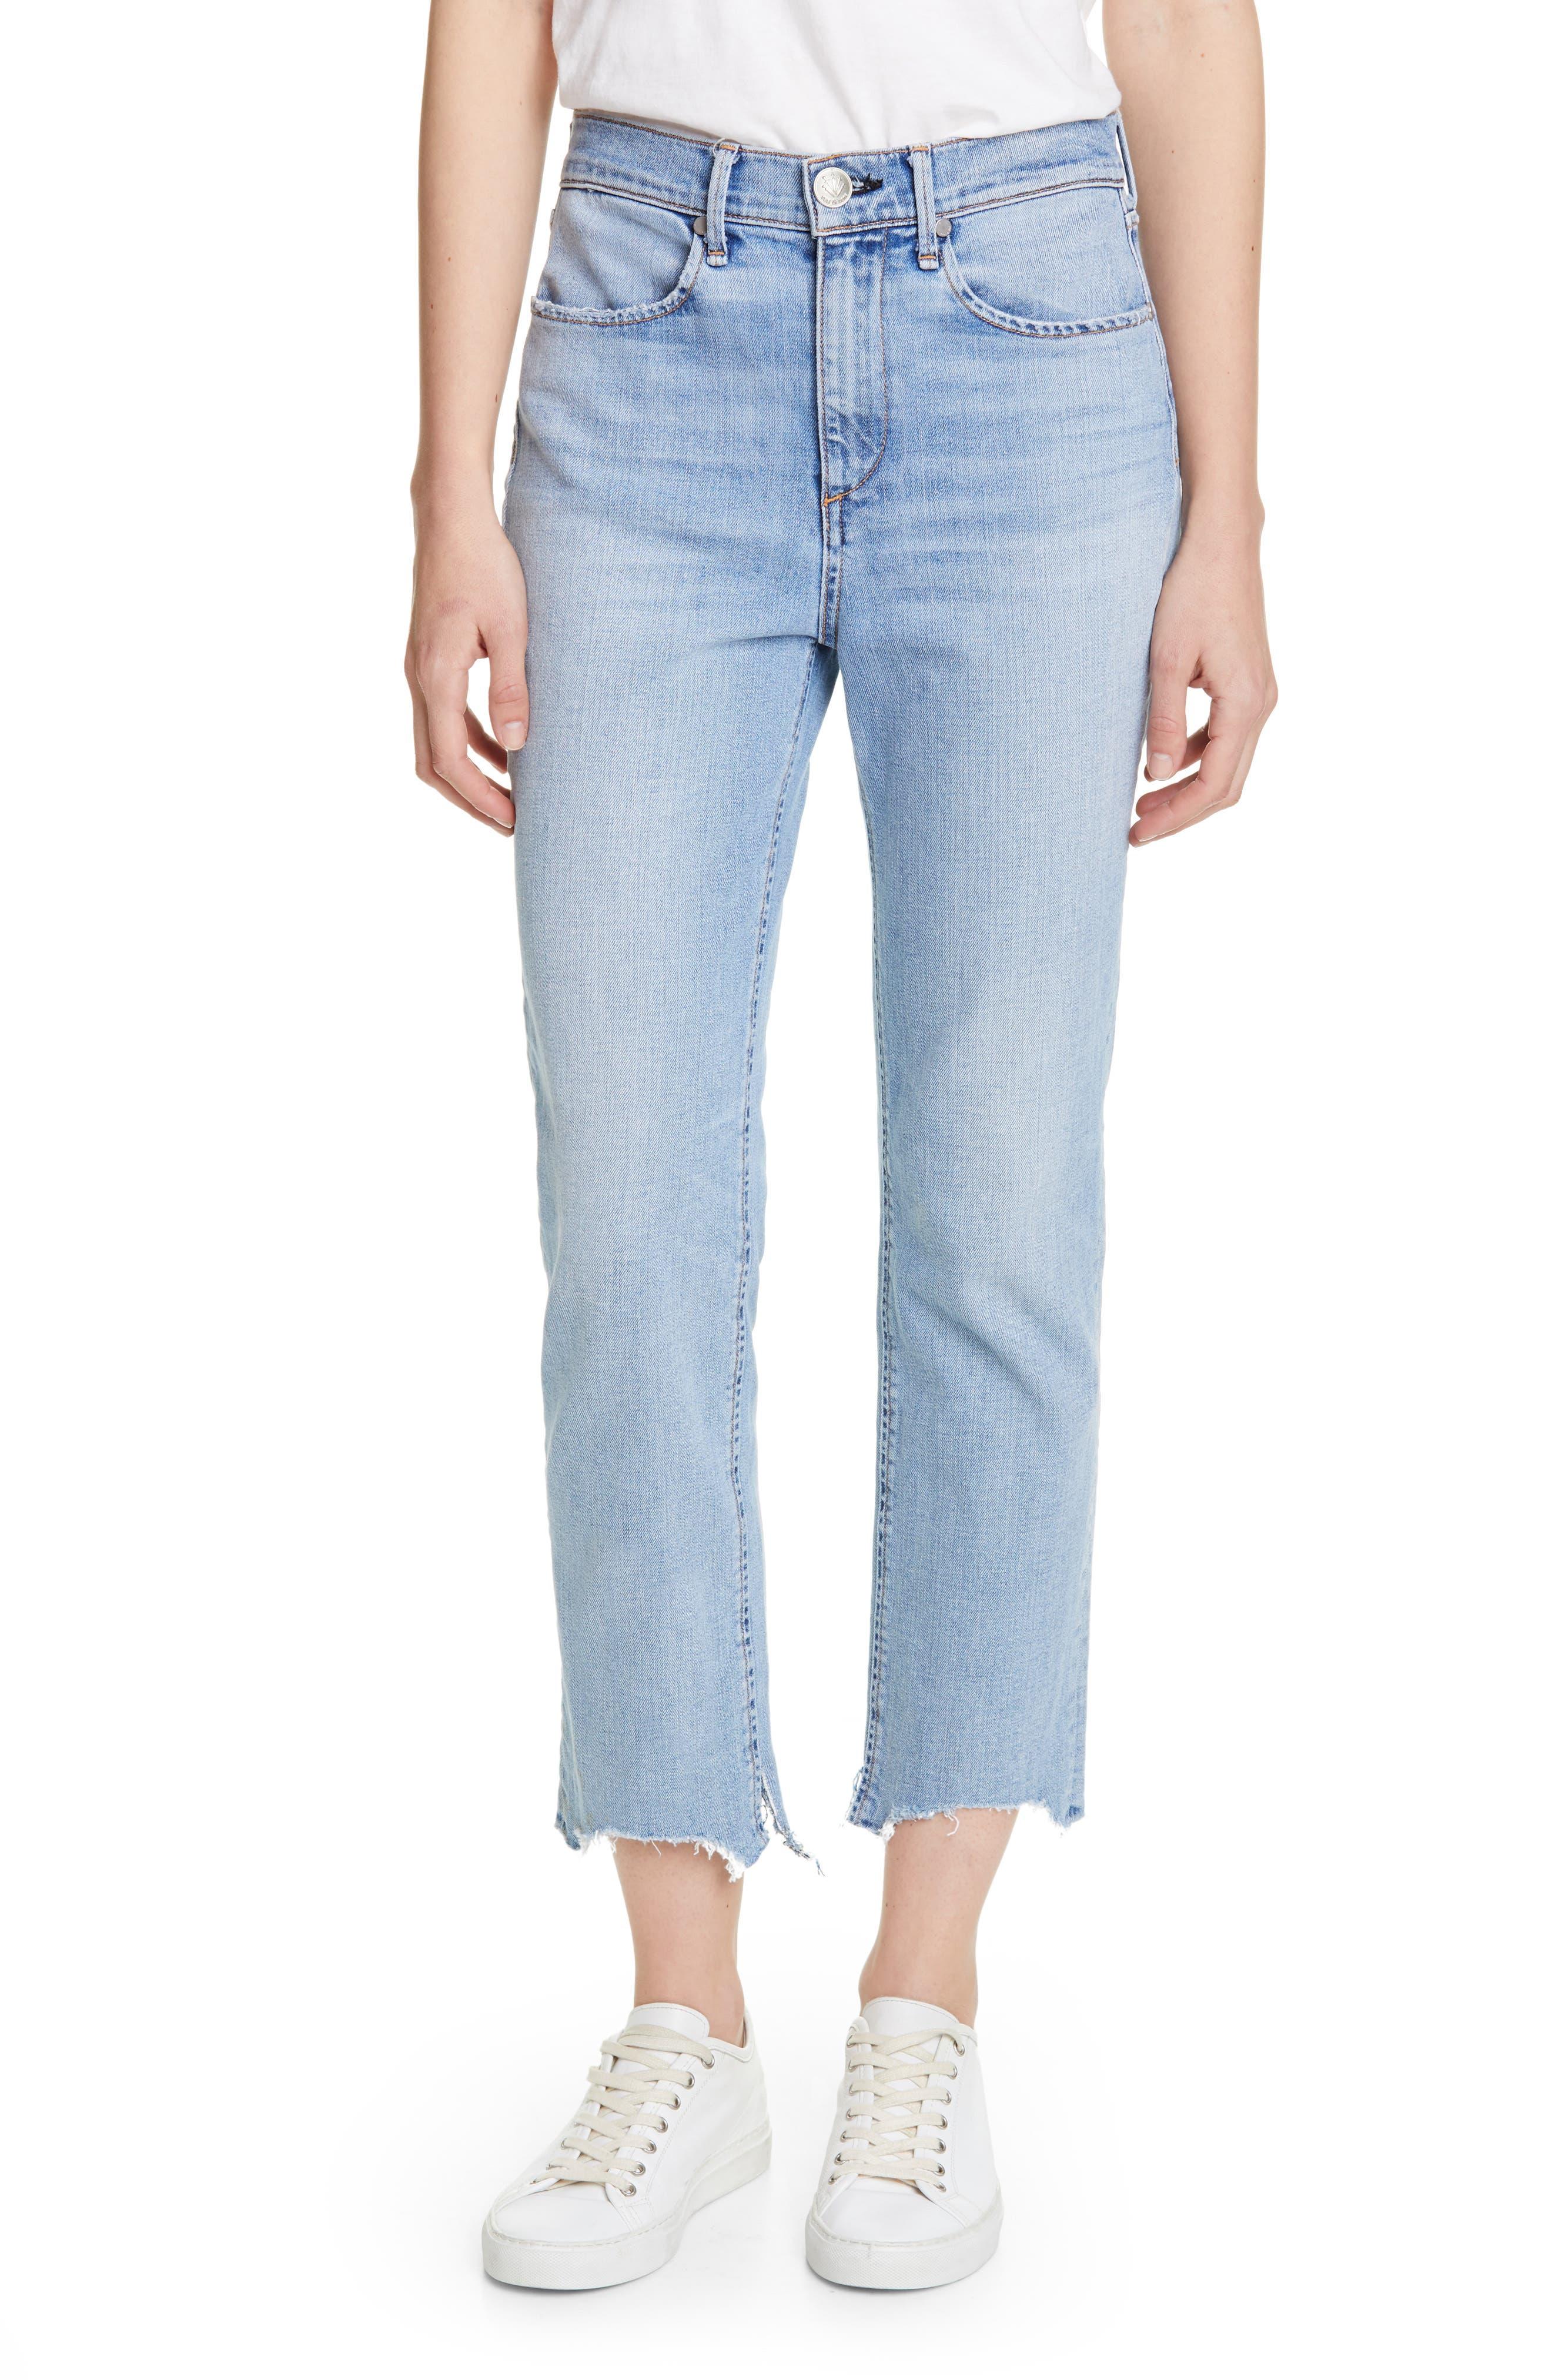 Nina High Waist Crop Cigarette Jeans by Rag & Bone